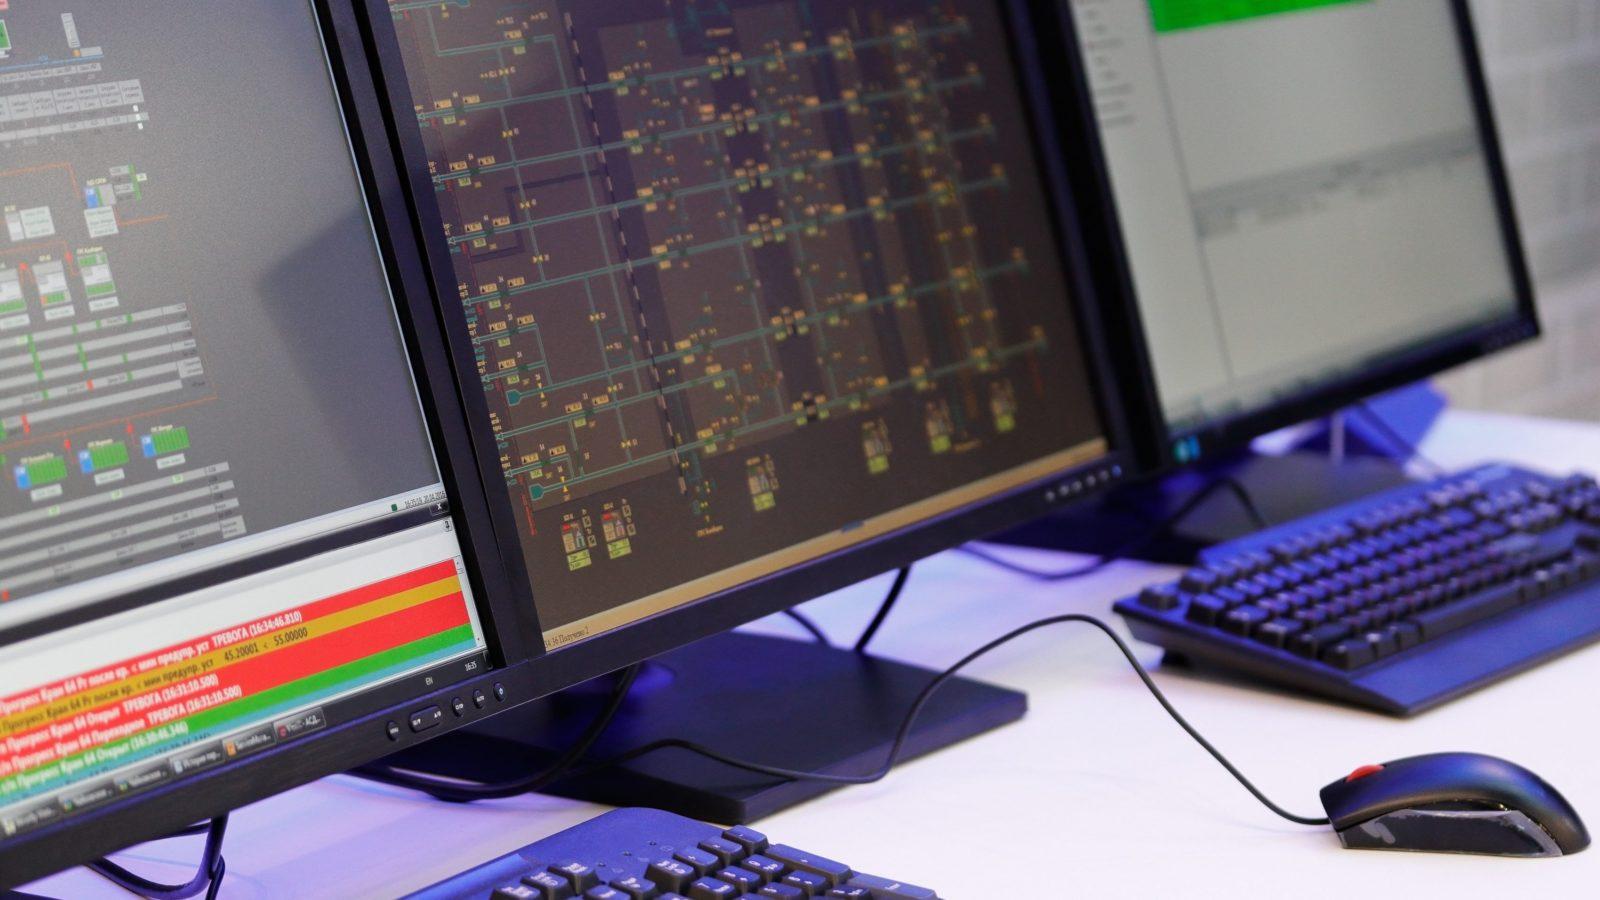 computer displays representing website hosting